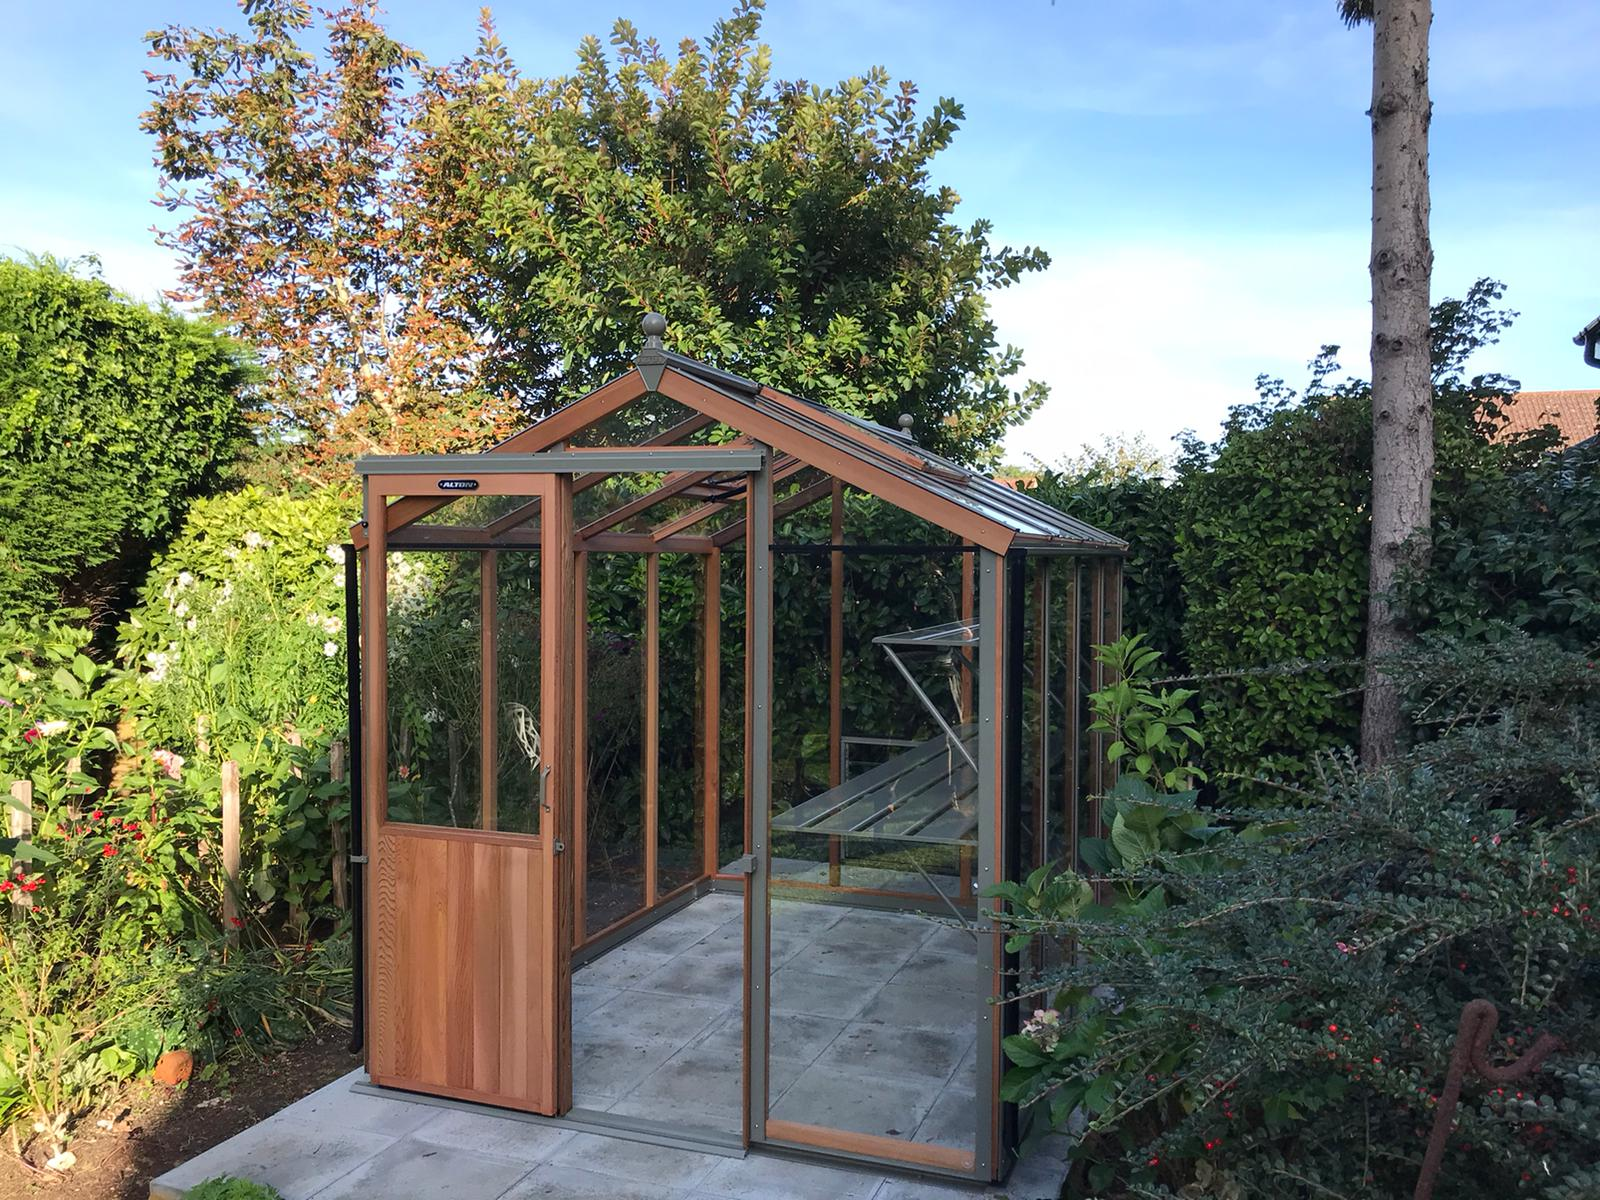 8ft x 6ft Alton Cedar Greenhouse Installation in Billingshurst West Sussex - Magson